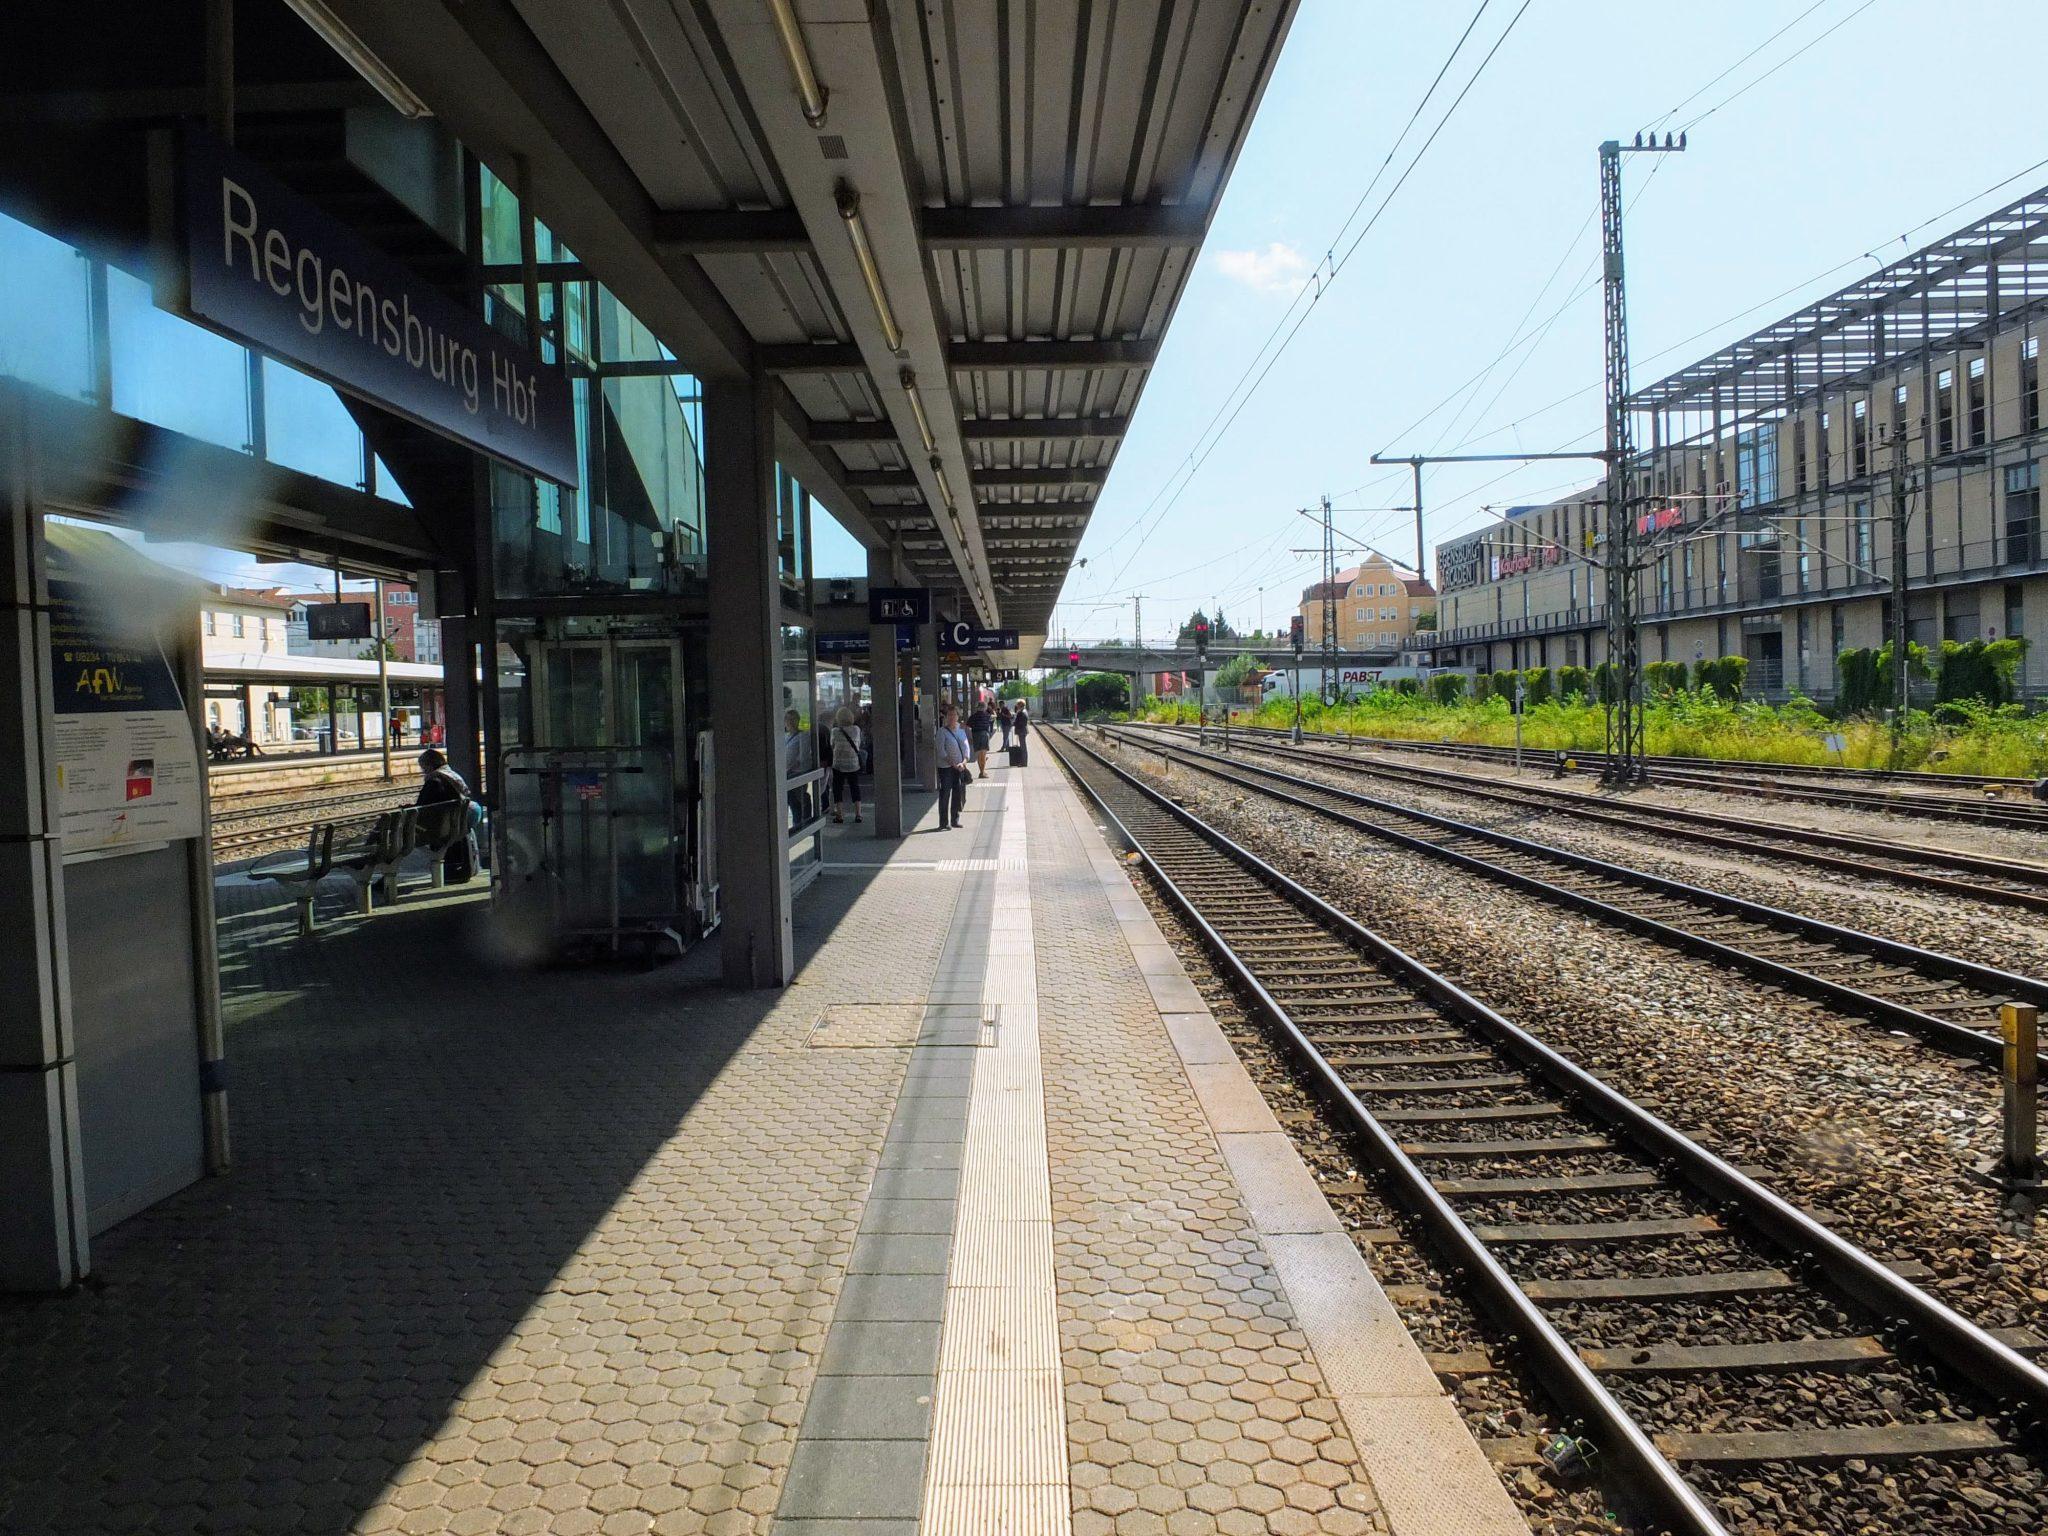 Changing trains for Straubing at Regensburg